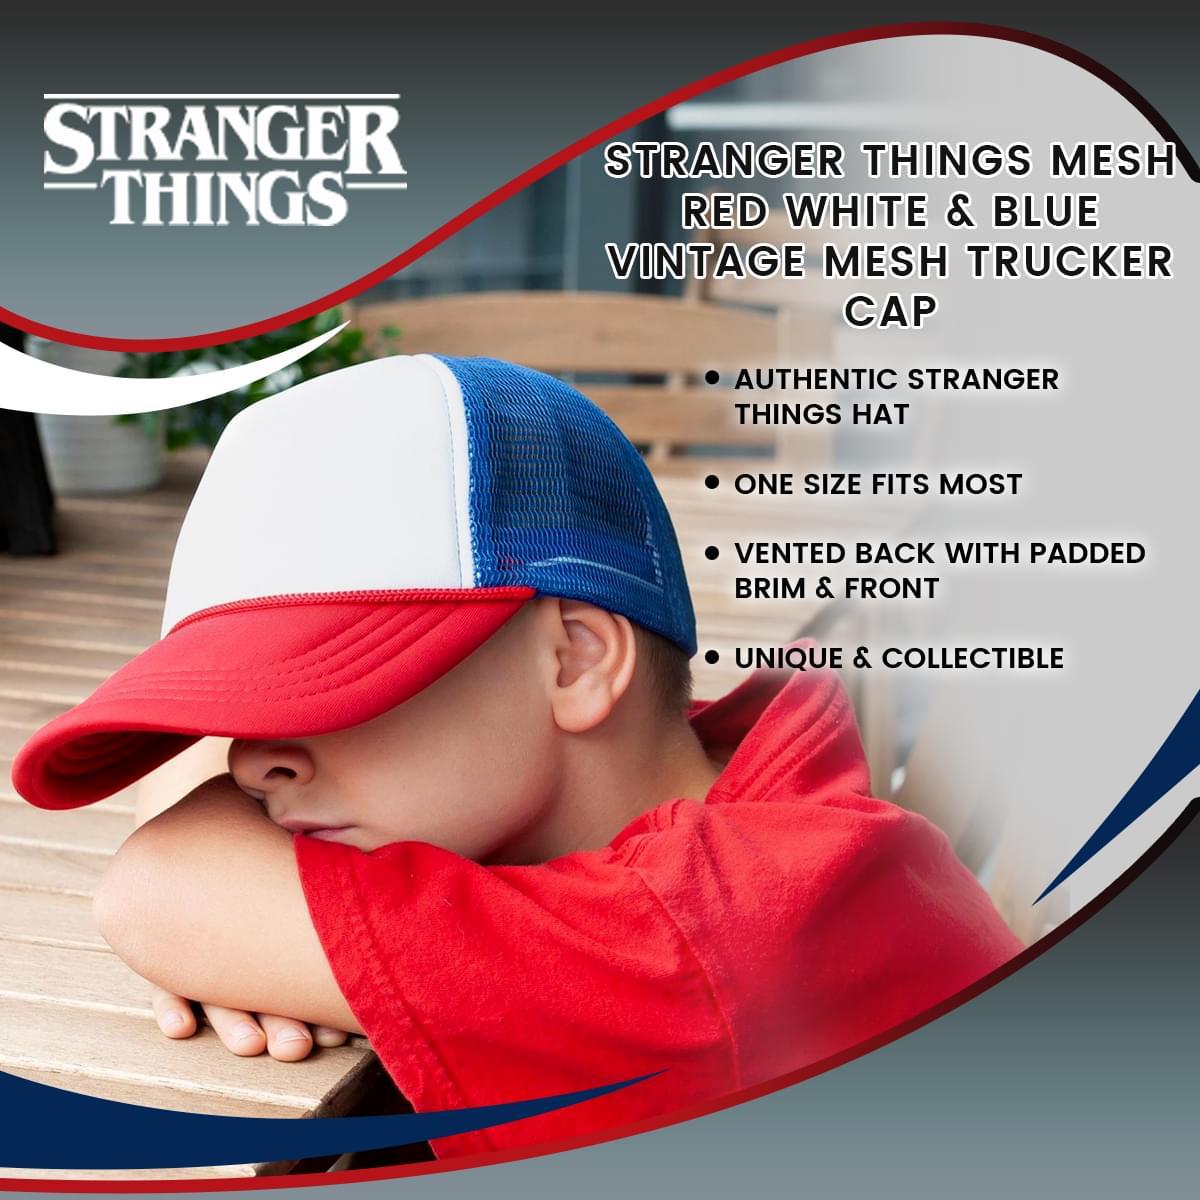 27e91ceeb5bef Stranger Things Mesh Red White   Blue Vintage Mesh Trucker Cap - Walmart.com